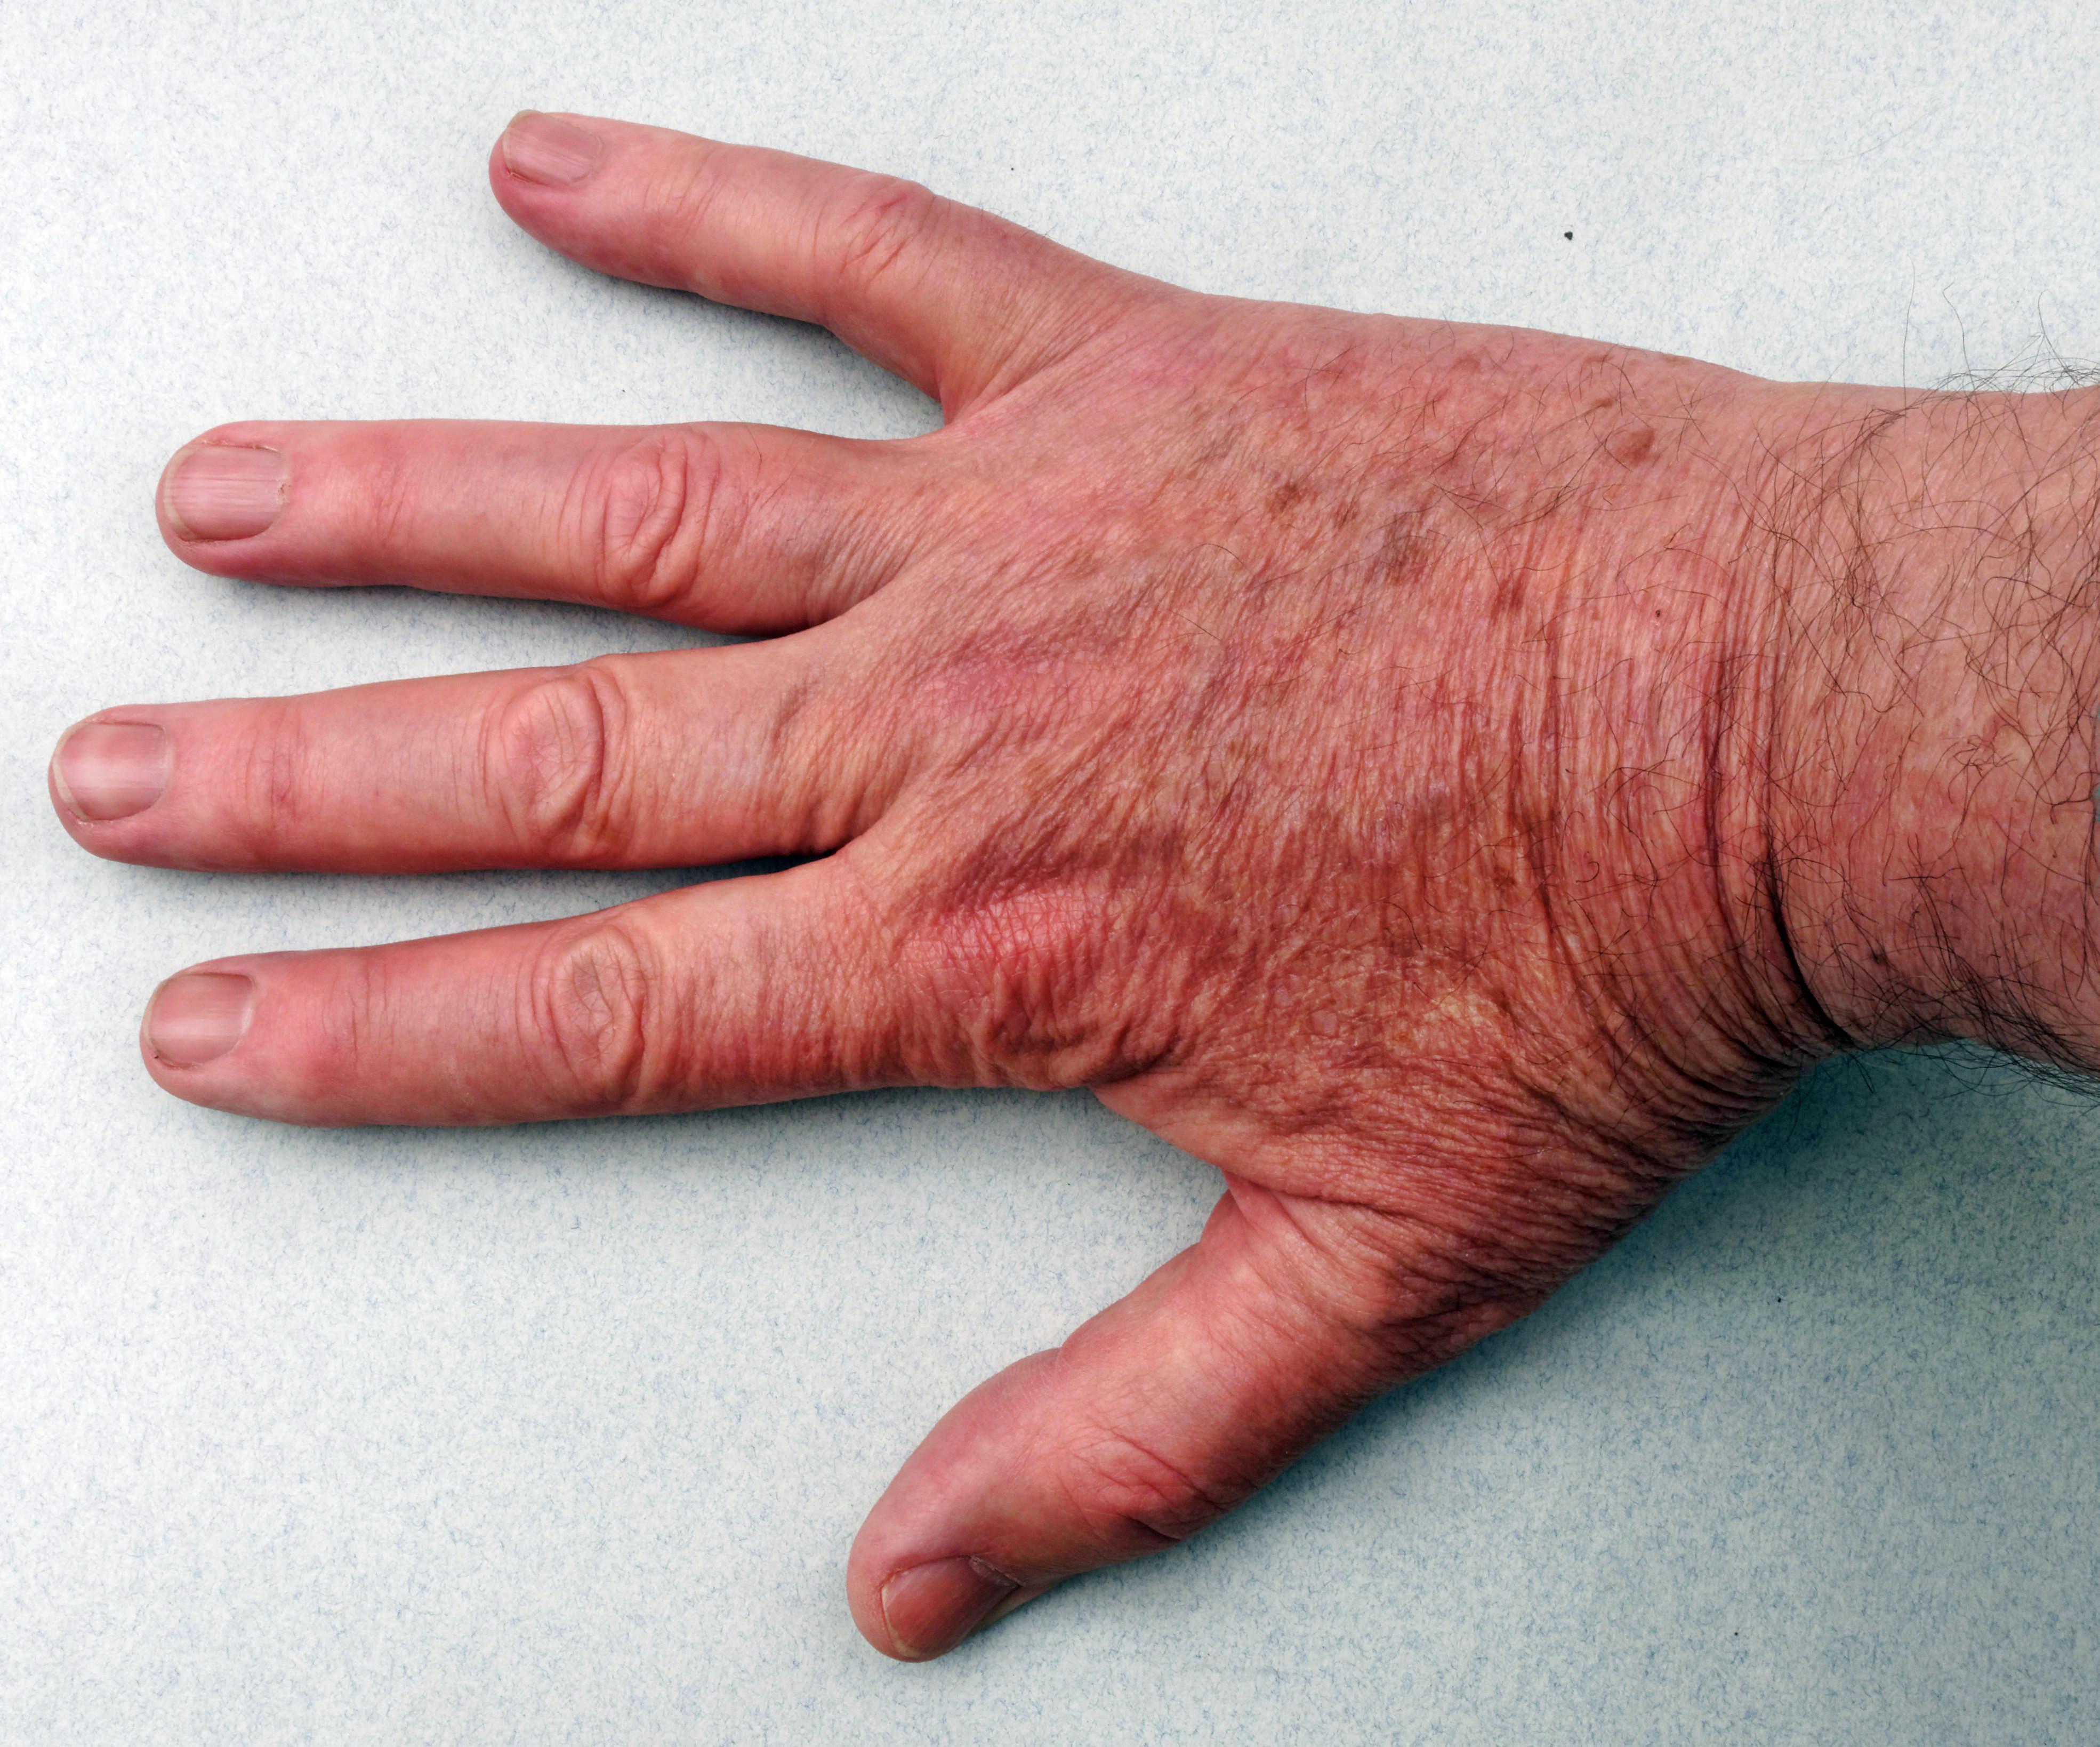 Hand-2.jpeg